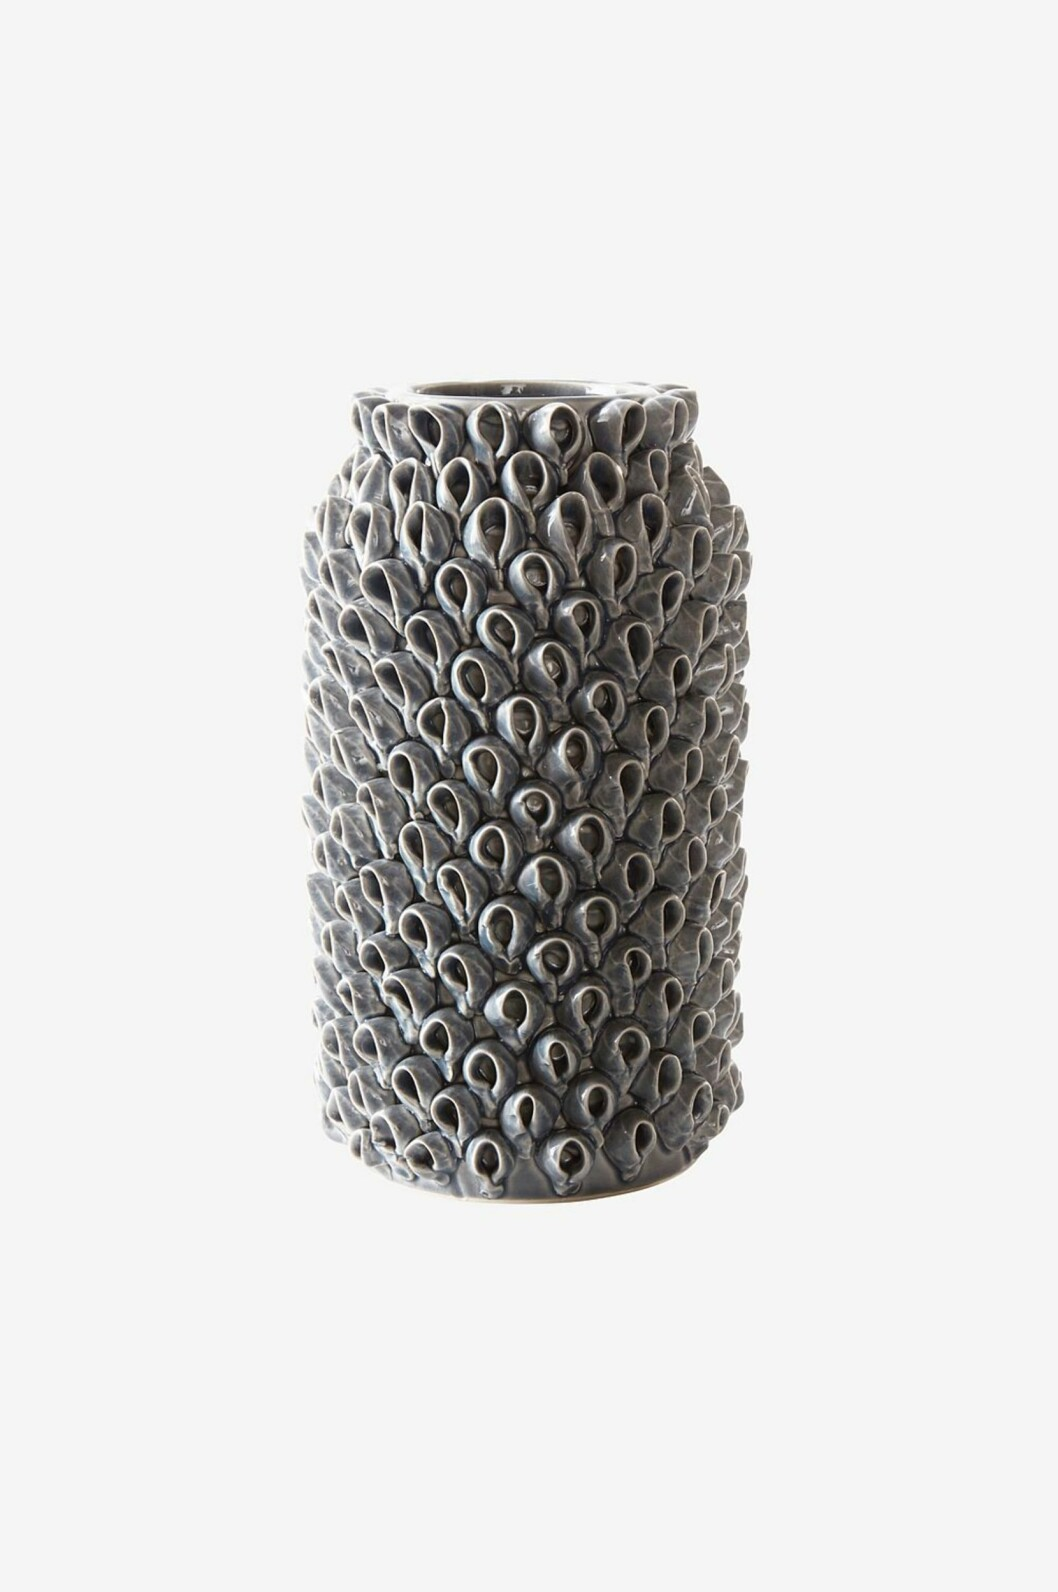 Vase fra Jotex |500,-| https://www.jotex.no/blowfish/blowfish-vase-rett/1515721